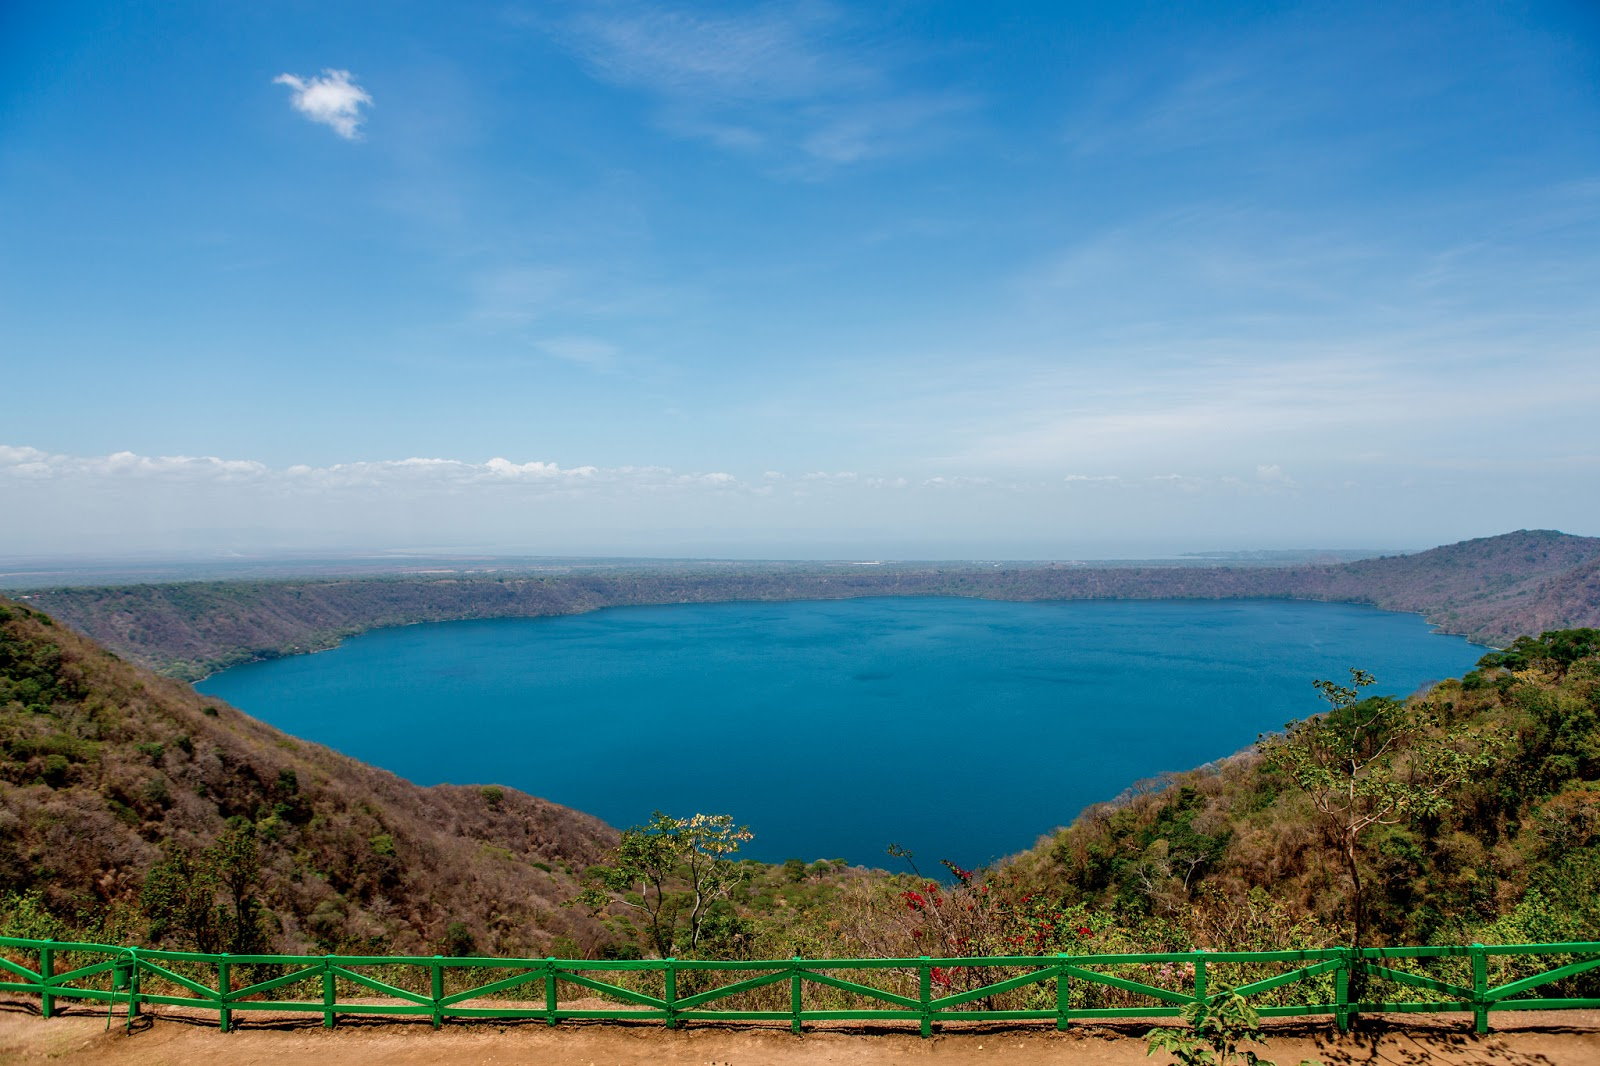 Nicaragua, Catarina, Laguna de Apoyo